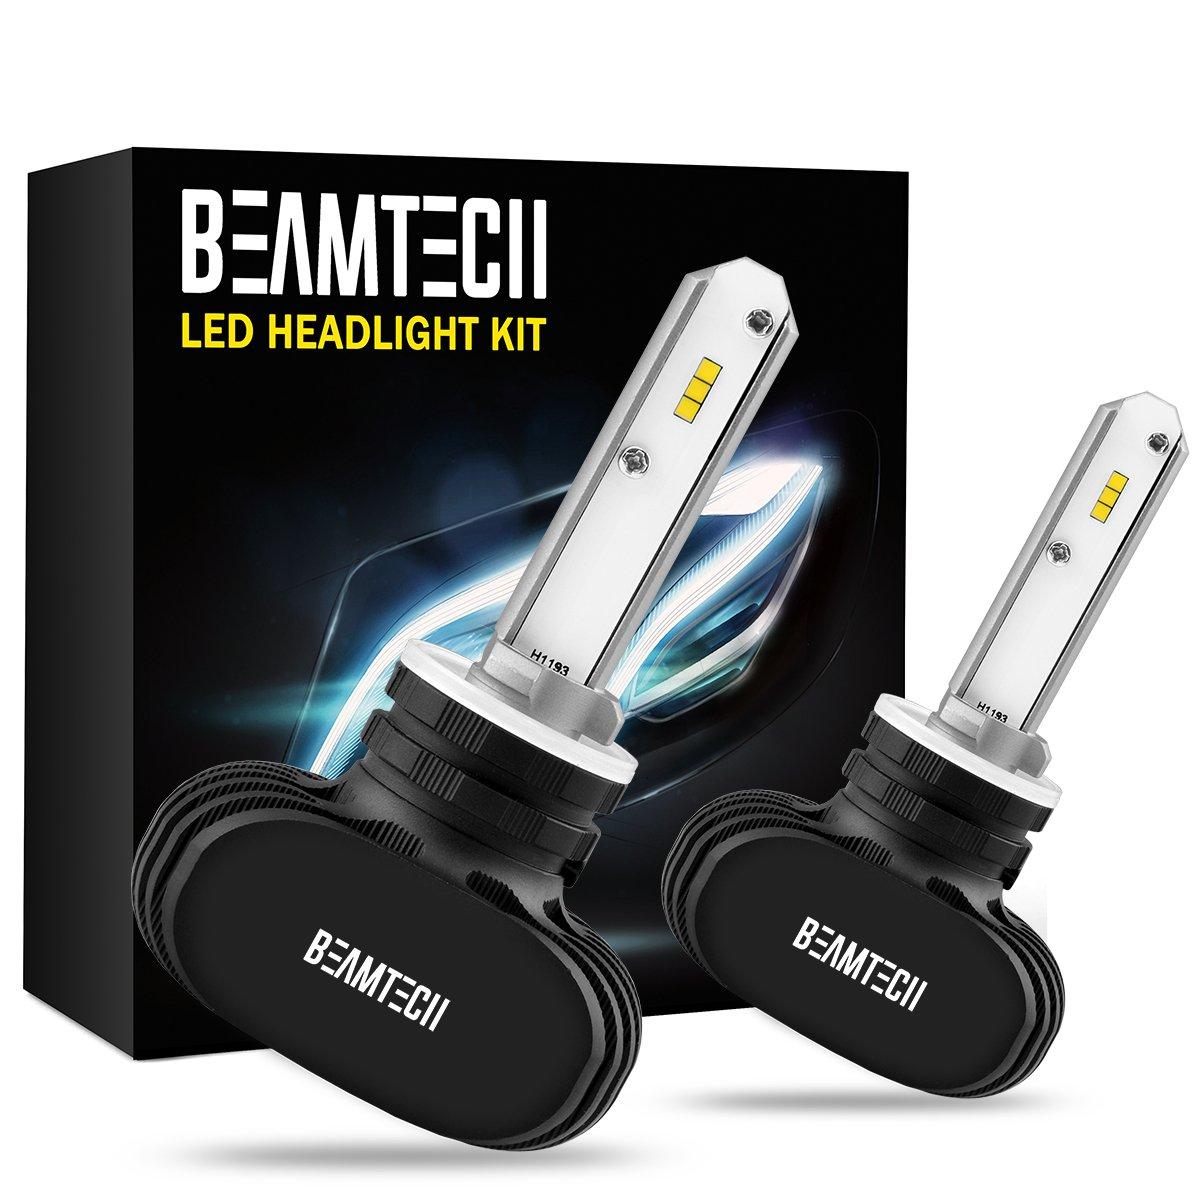 BEAMTECH 880 LED Headlight Bulb, 50W 6500K 8000Lumens Extremely Brigh 885 893 899 CSP Chips Conversion Kit